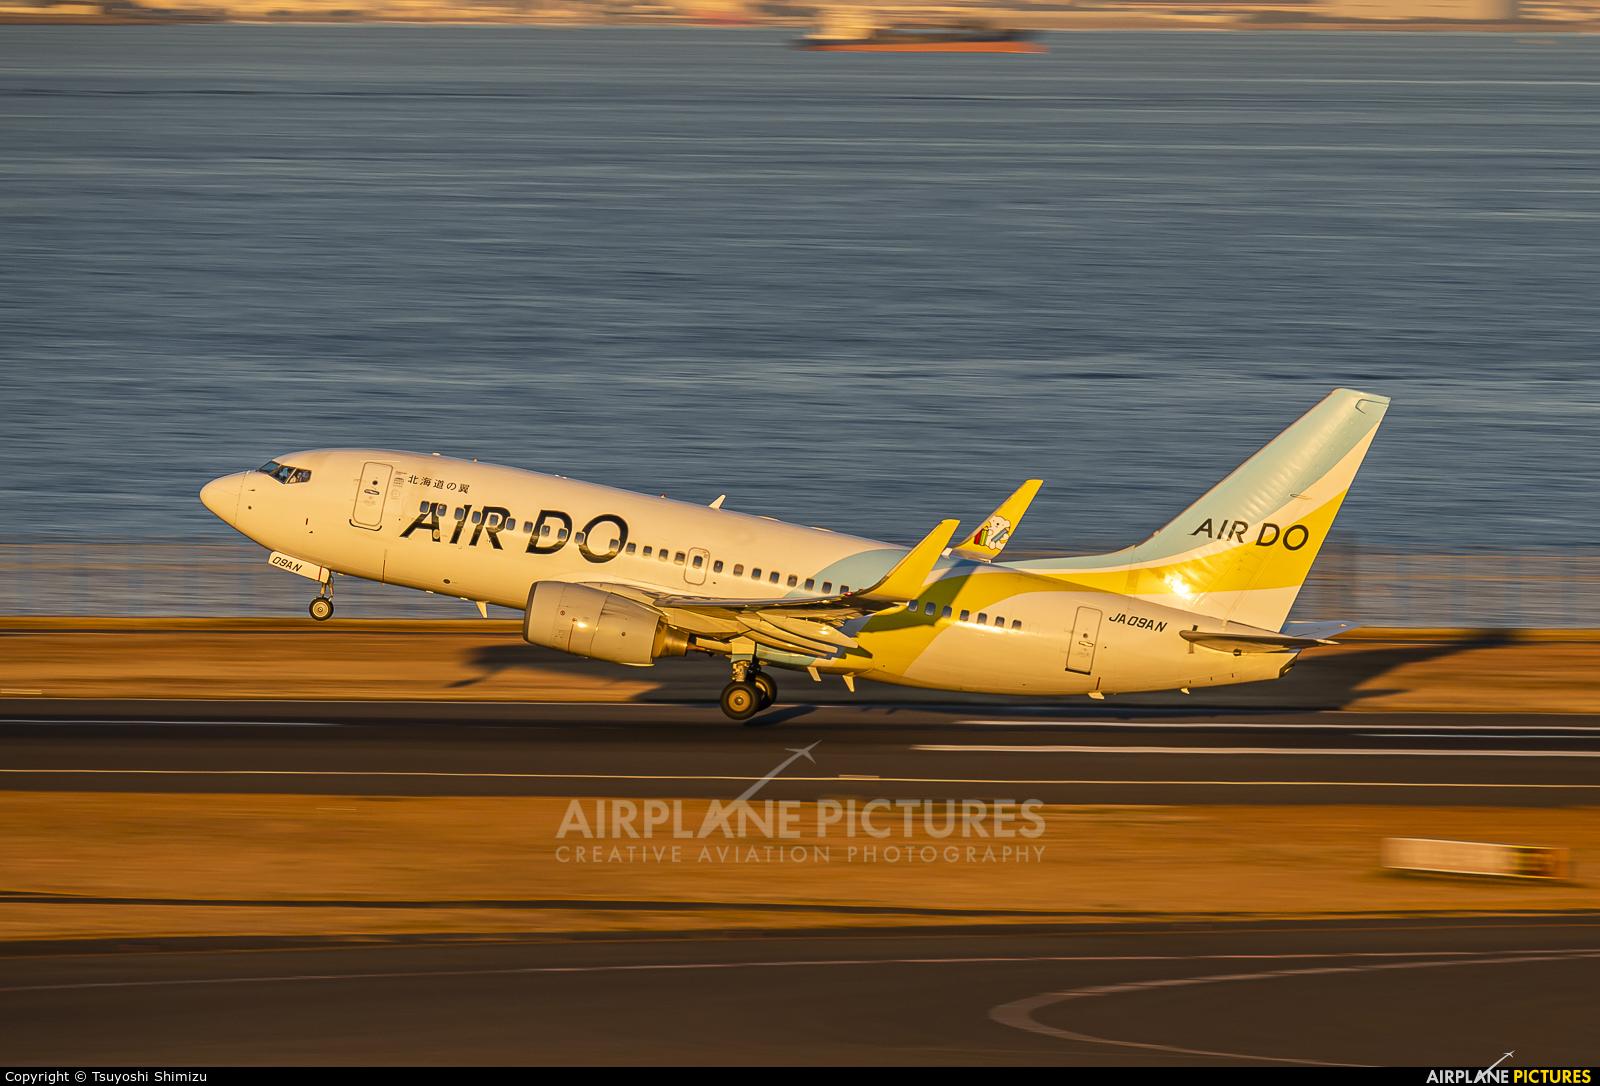 Air Do - Hokkaido International Airlines JA09AN aircraft at Tokyo - Haneda Intl